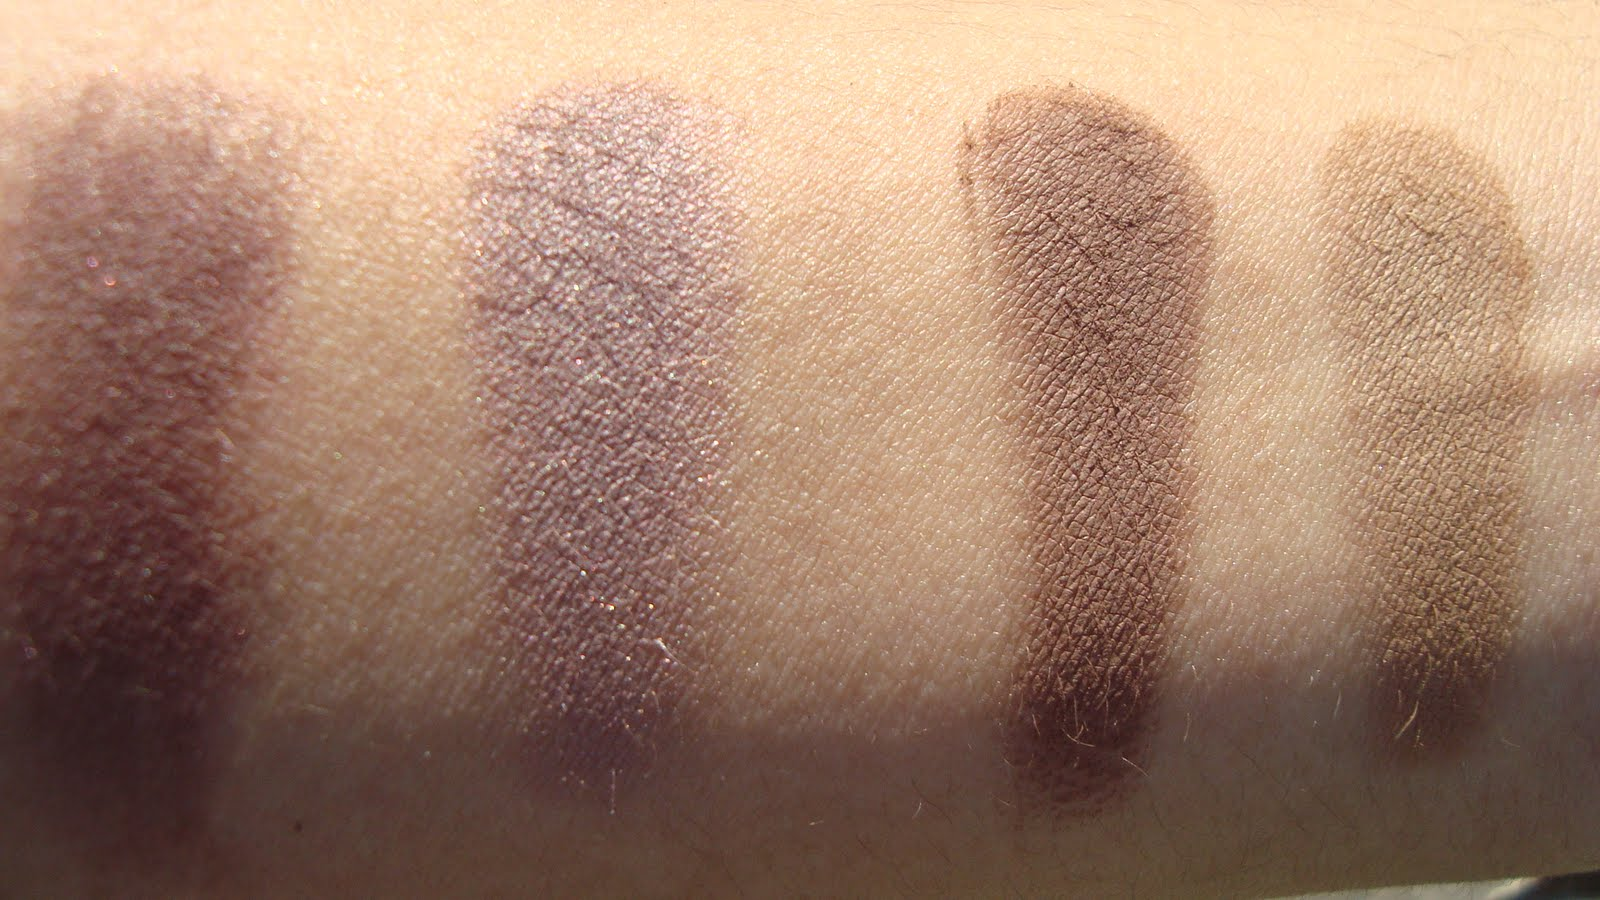 mac shale eyeshadow - photo #17